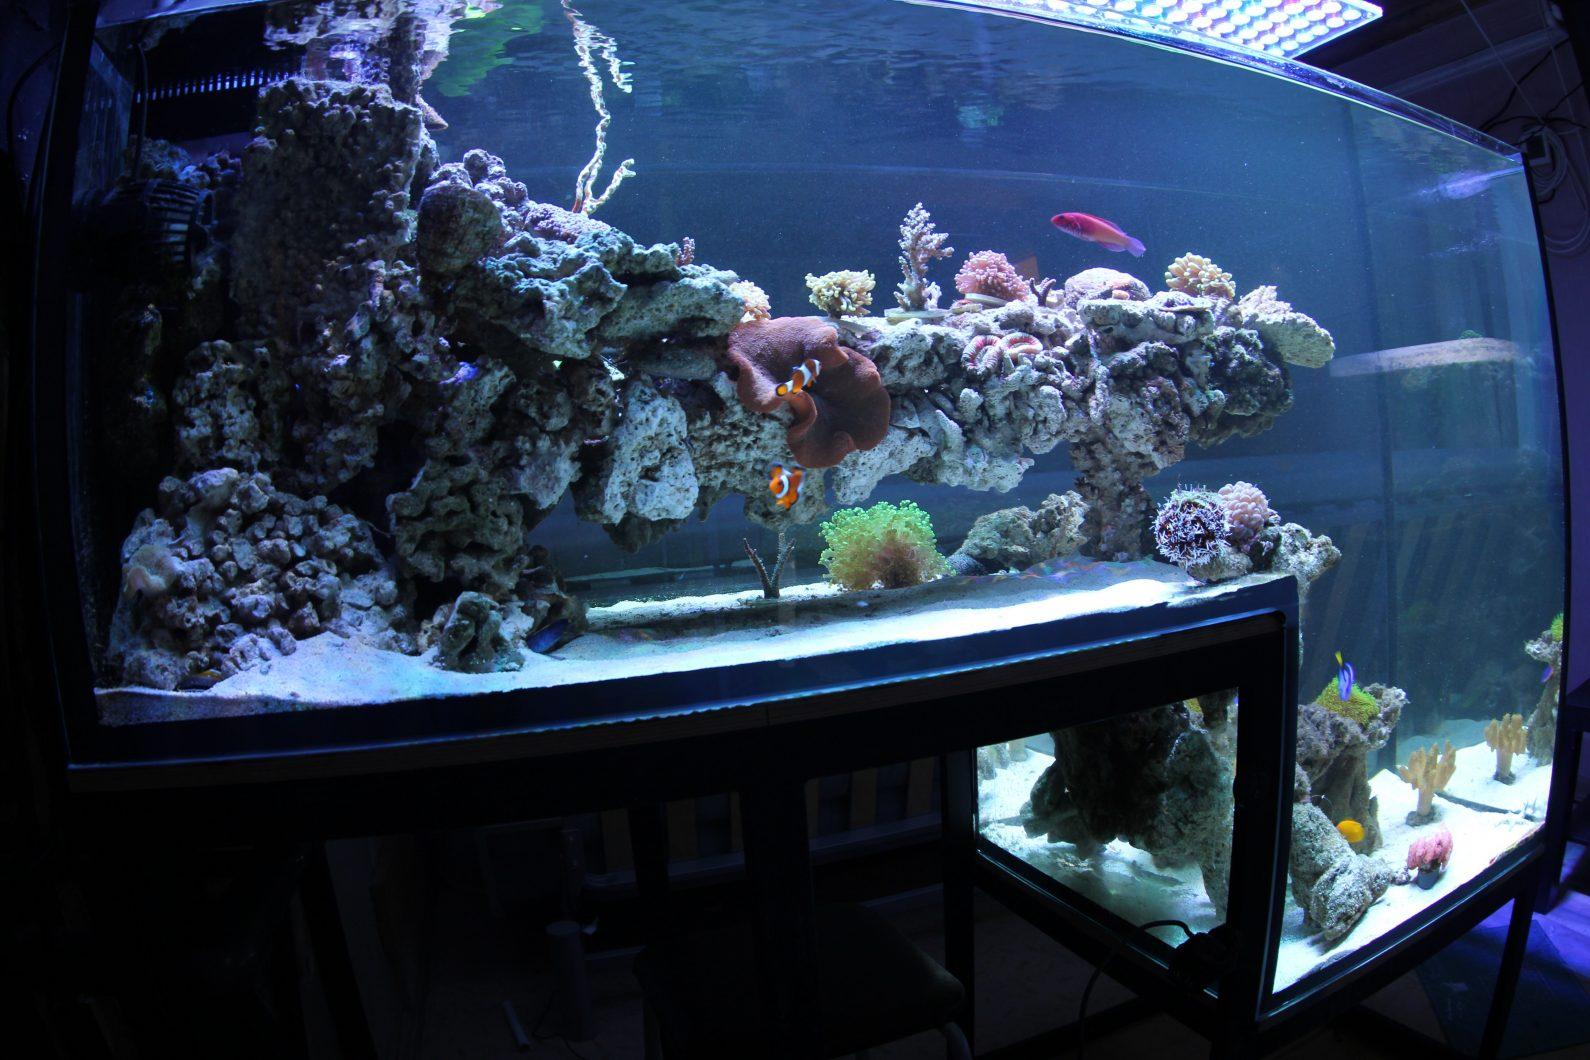 Dropoff рифов аквариума